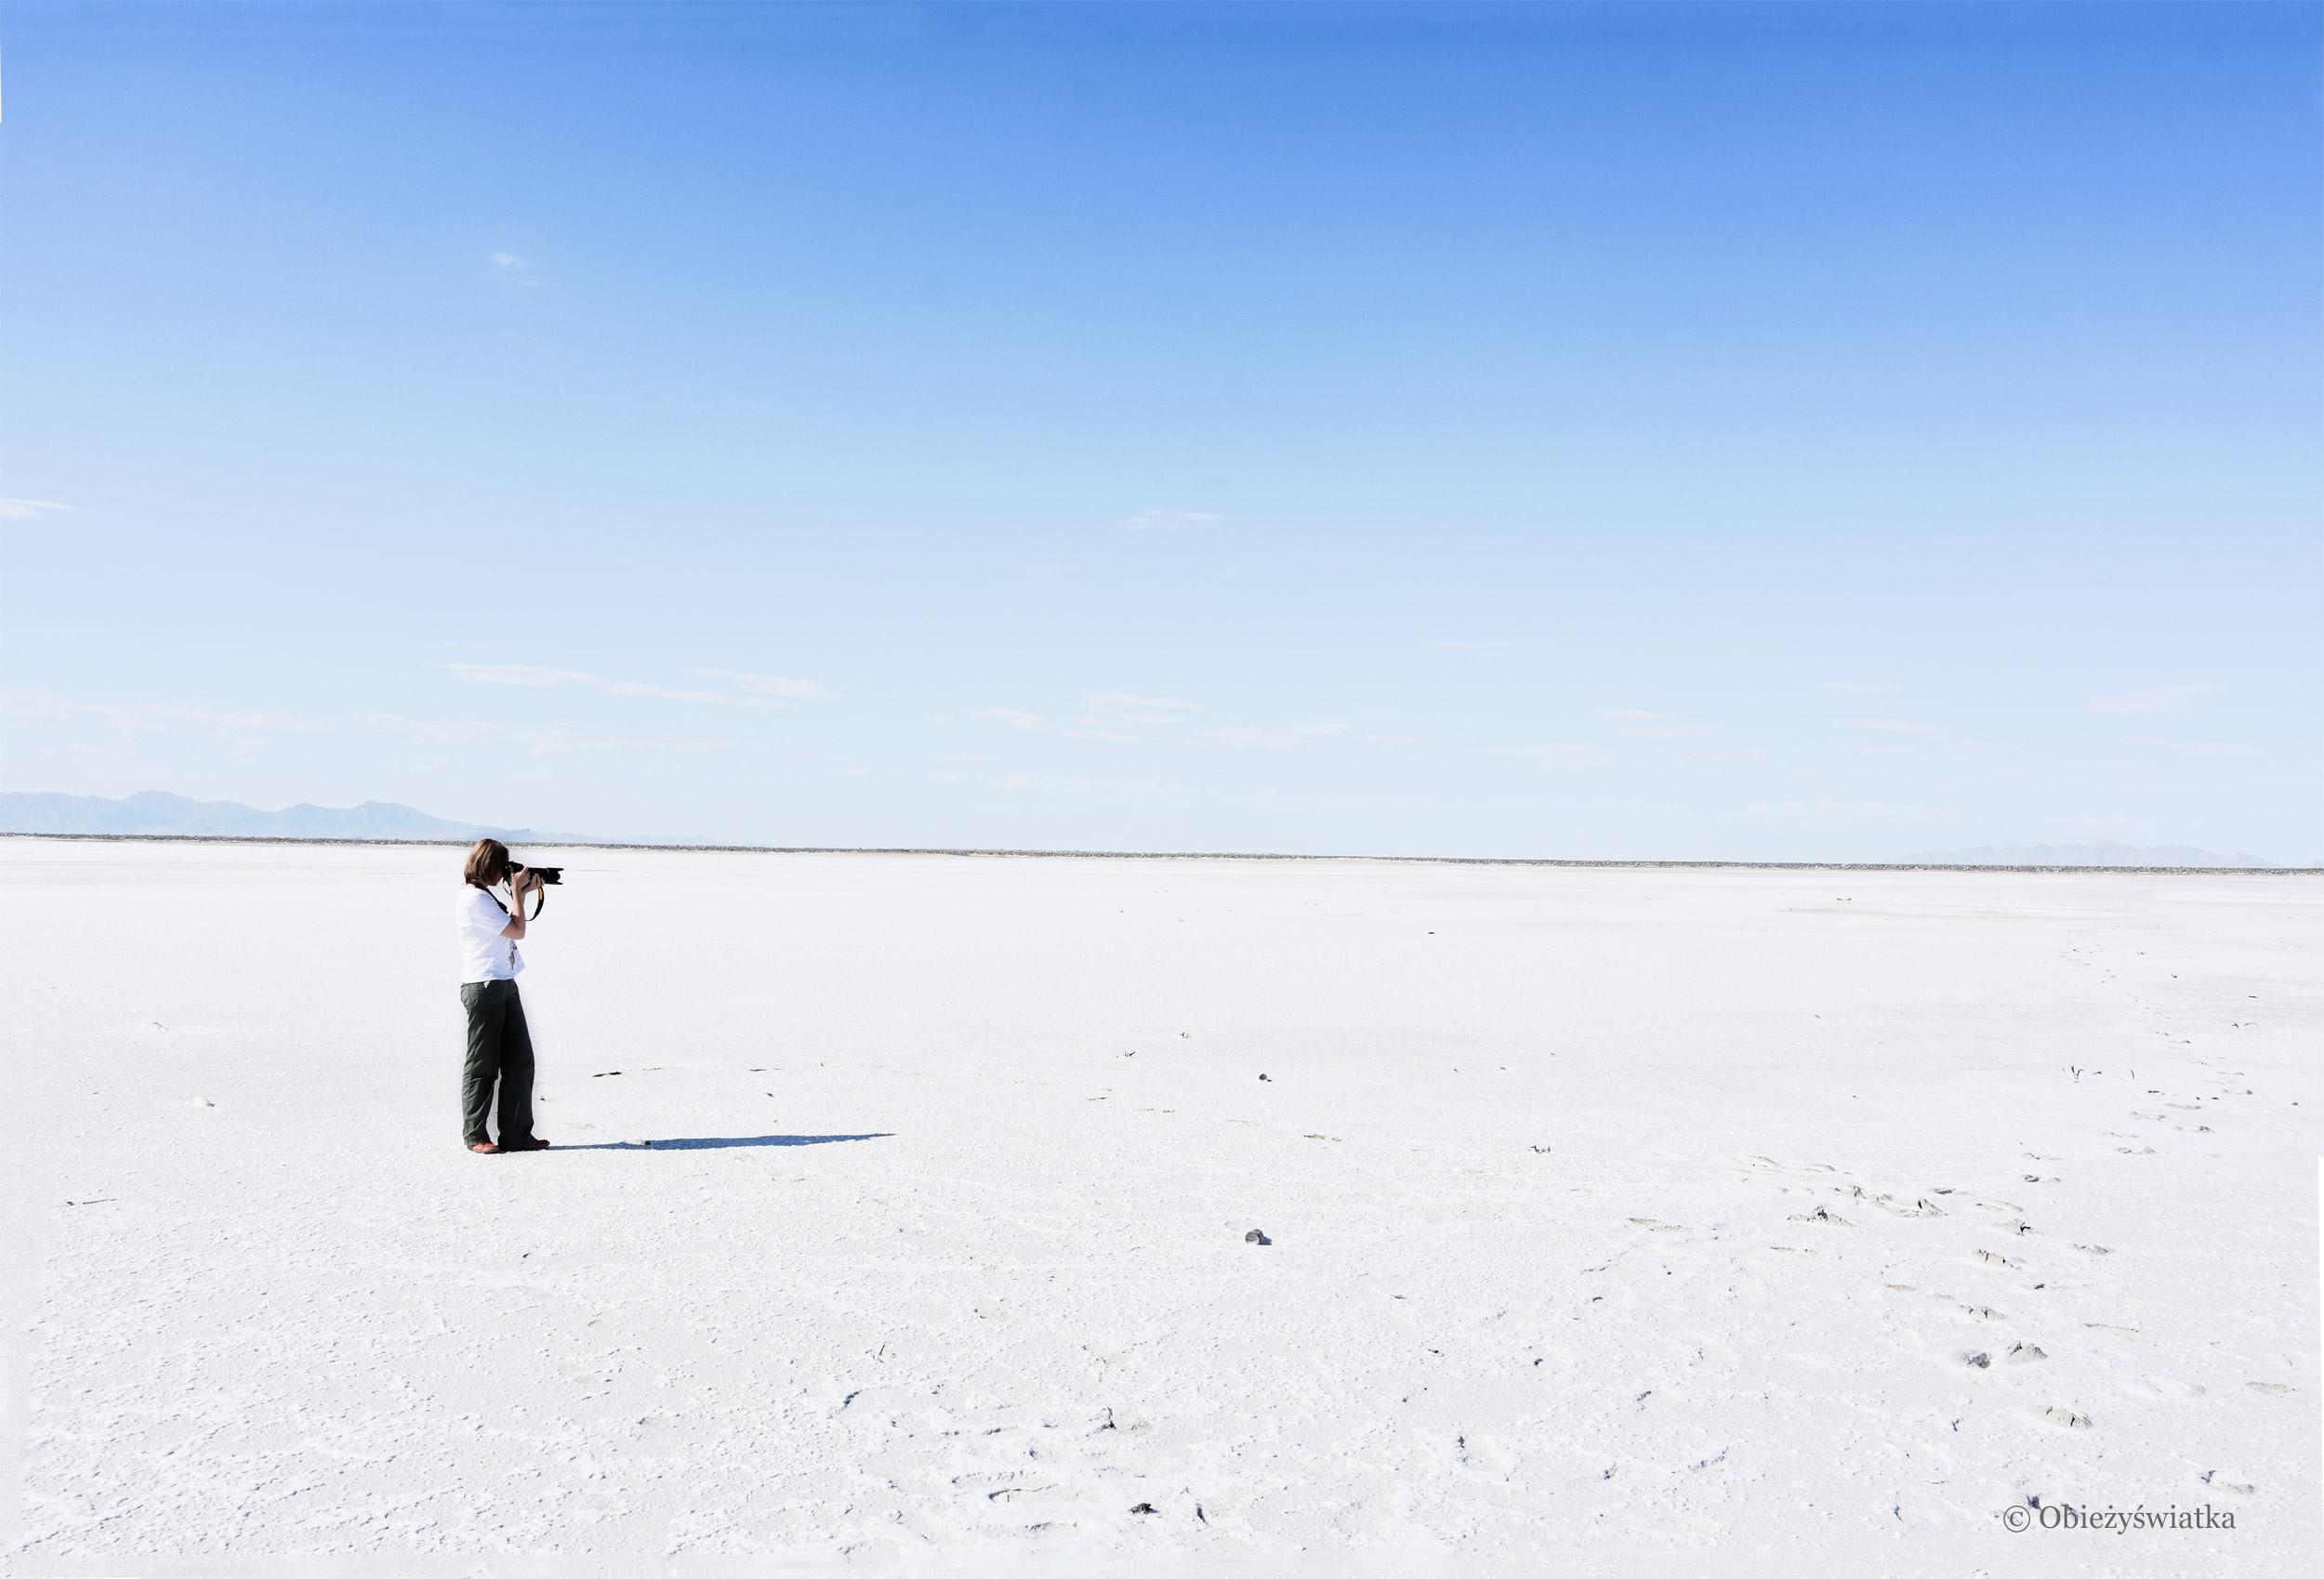 Biało aż po horyzontu kres..., Great Salt Lake Desert